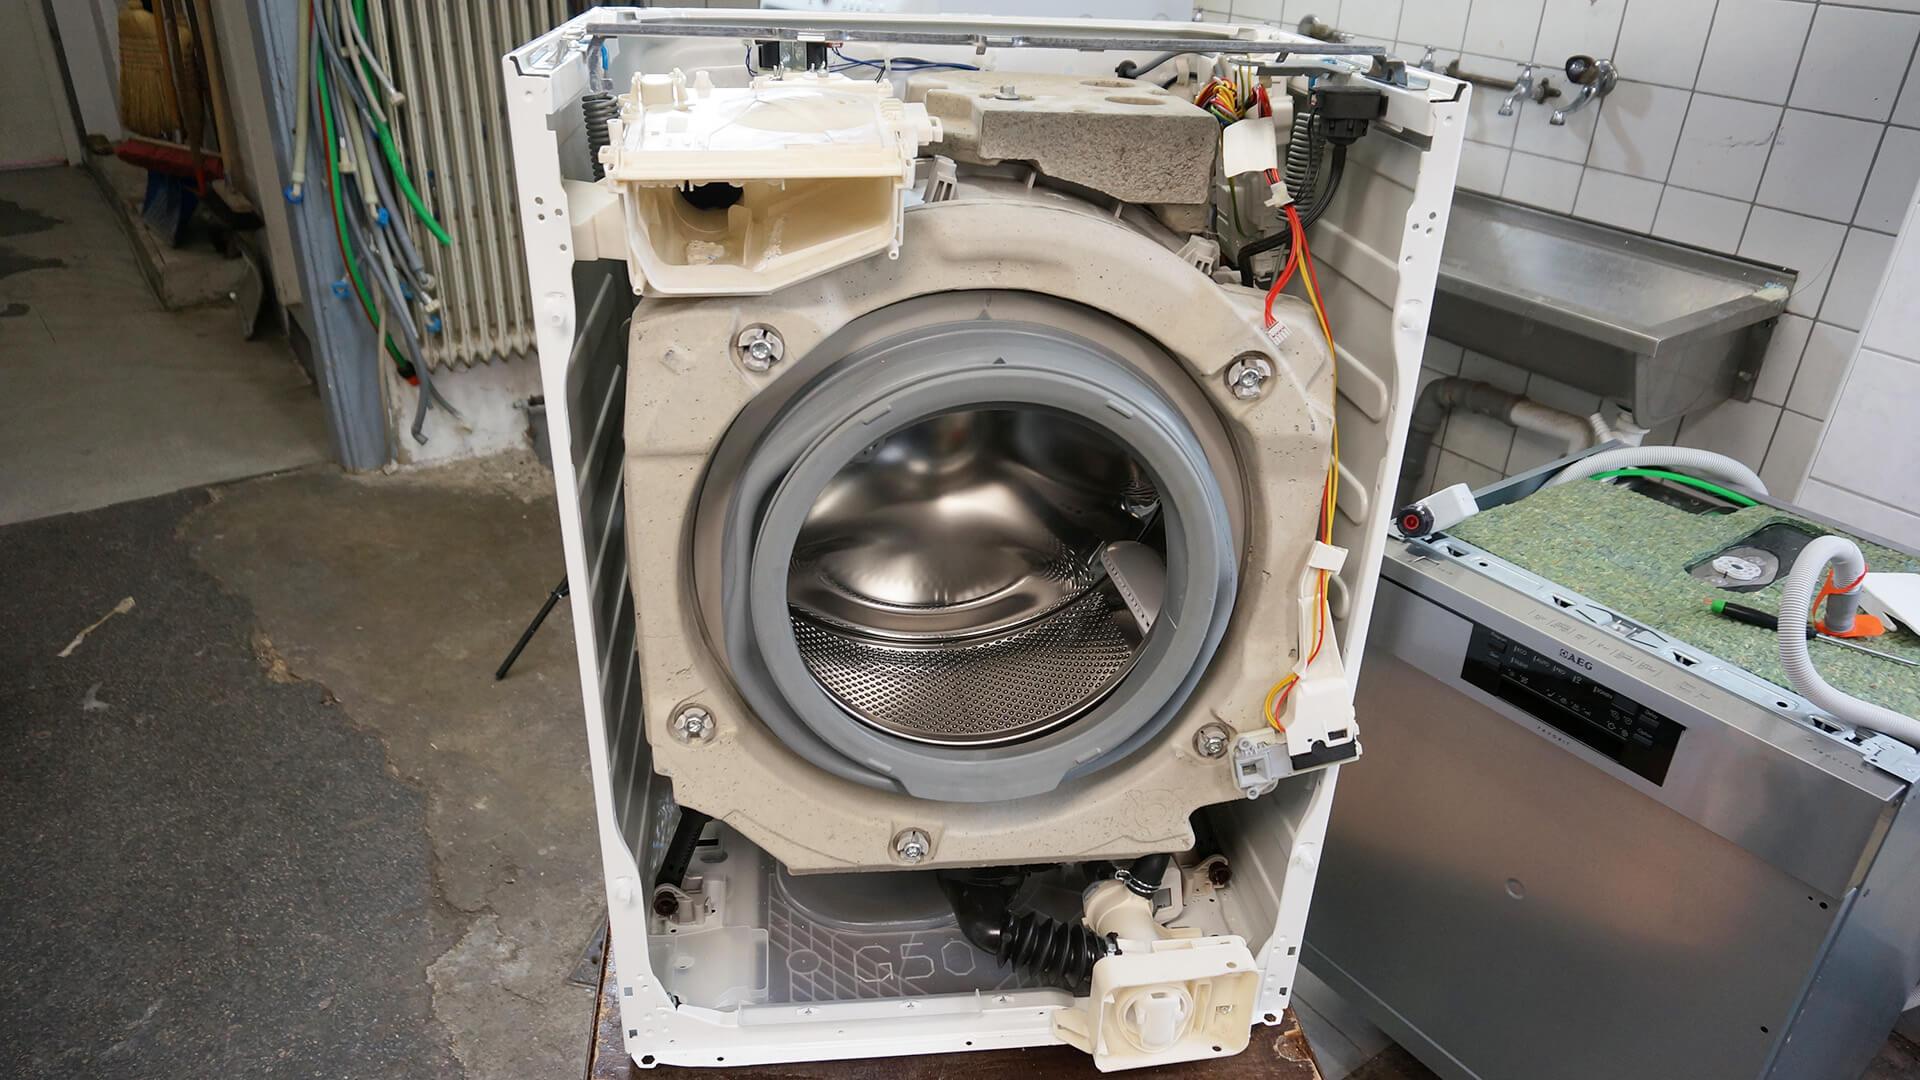 AEG Waschmaschine reparieren